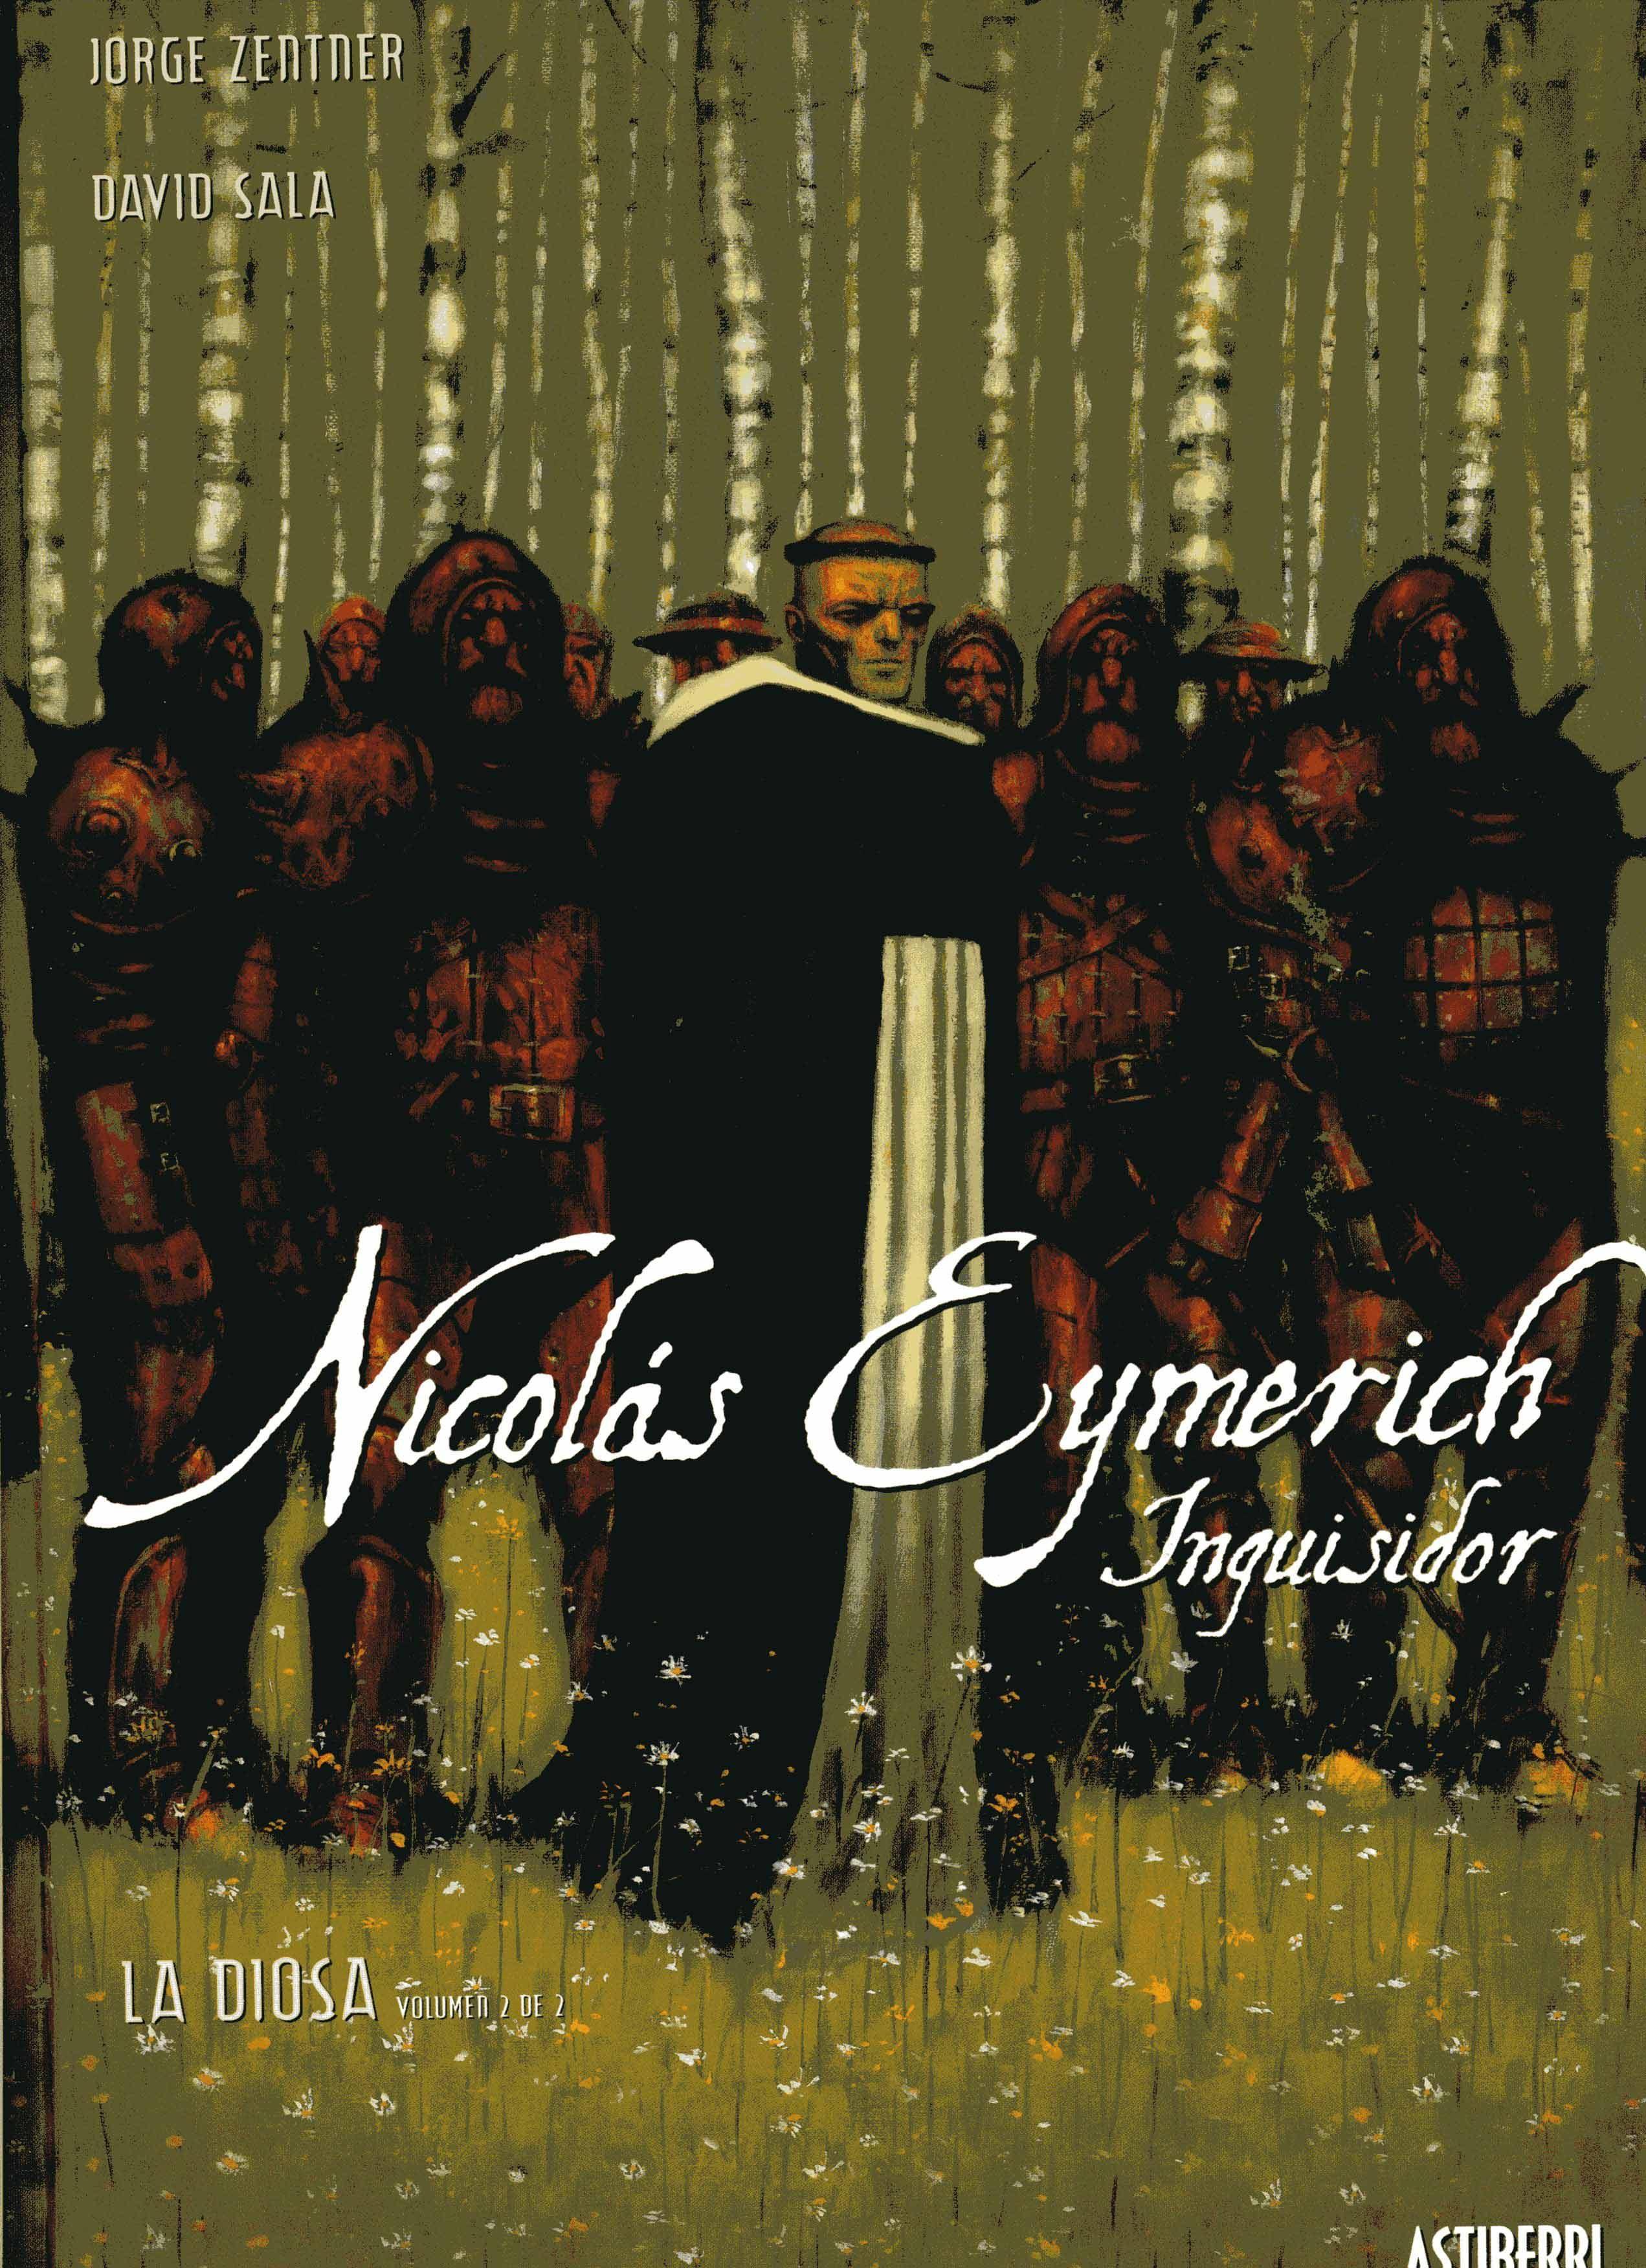 Nicolas Eymerich Inquisidor: La Diosa (volumen 2 De 2) - Zentner Hick Jorge